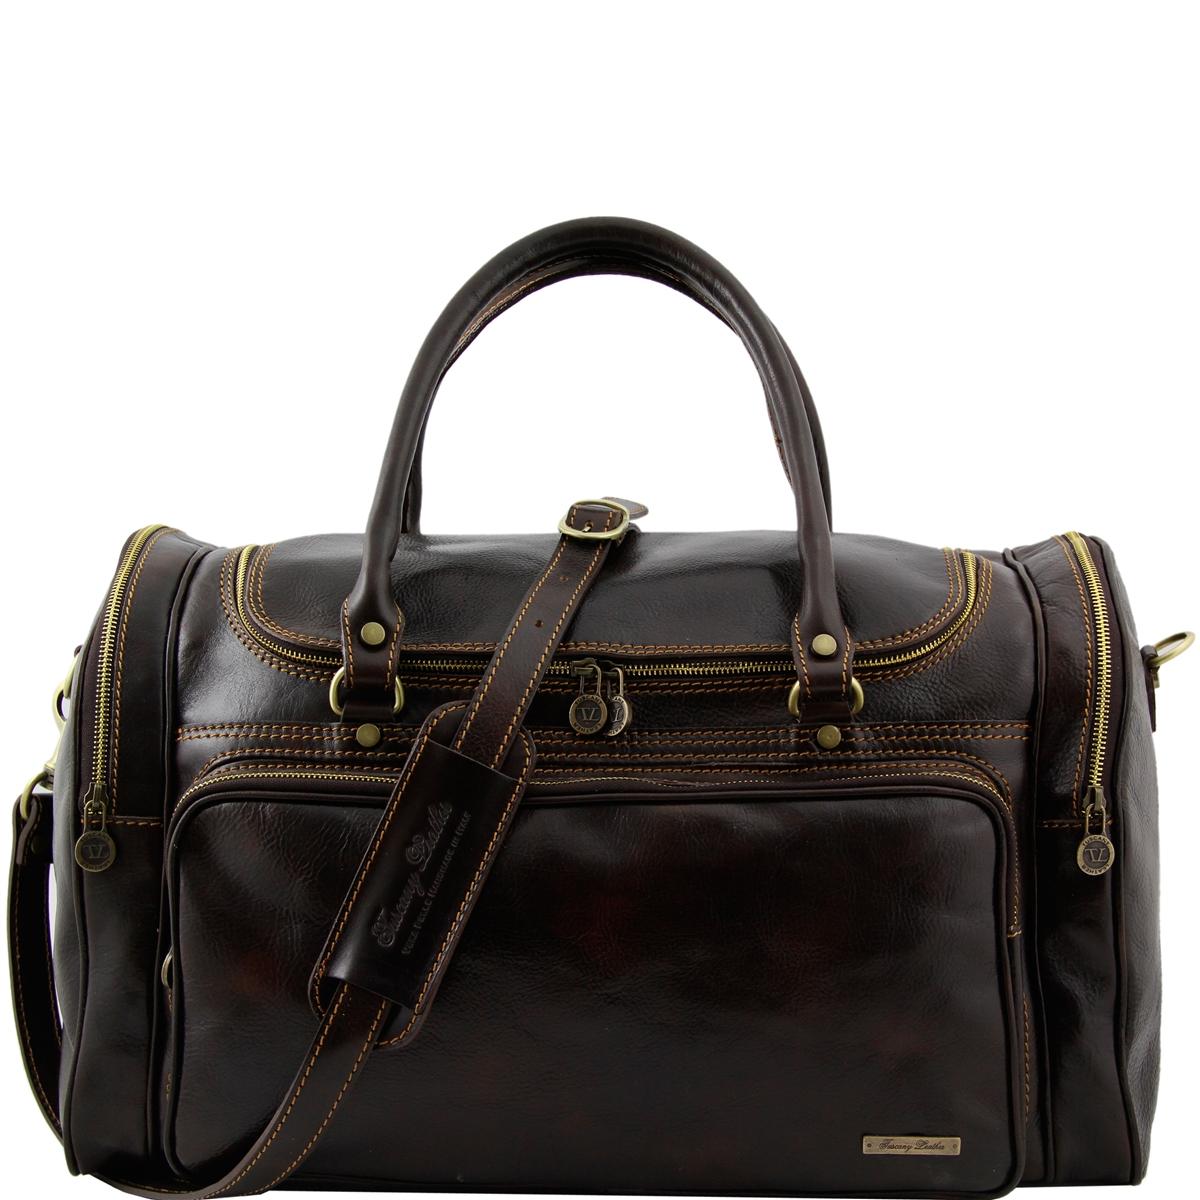 Tl1048 Praga Leather Travel Bag